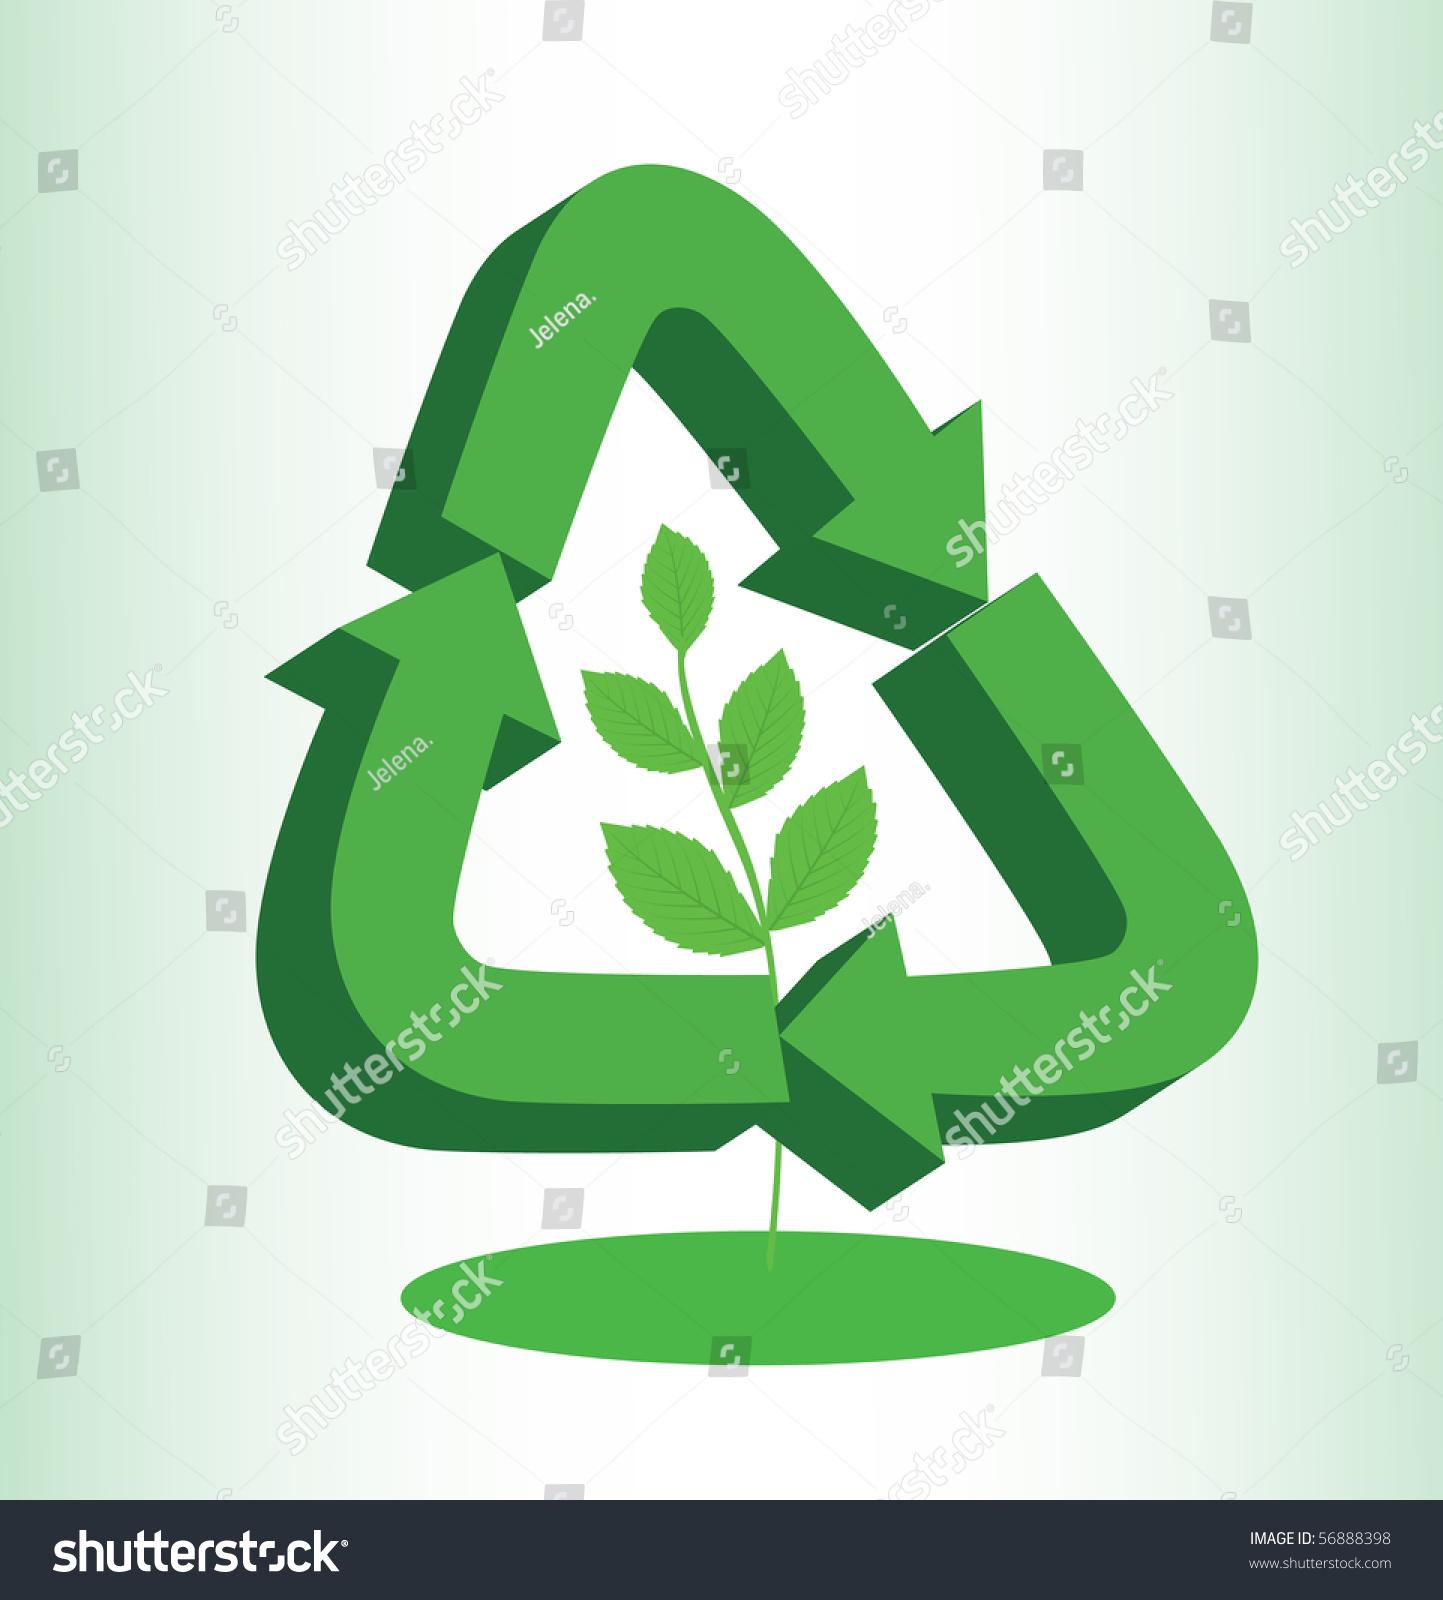 Recycle Sign Illustration Branch Leaves Inside Stock Illustration